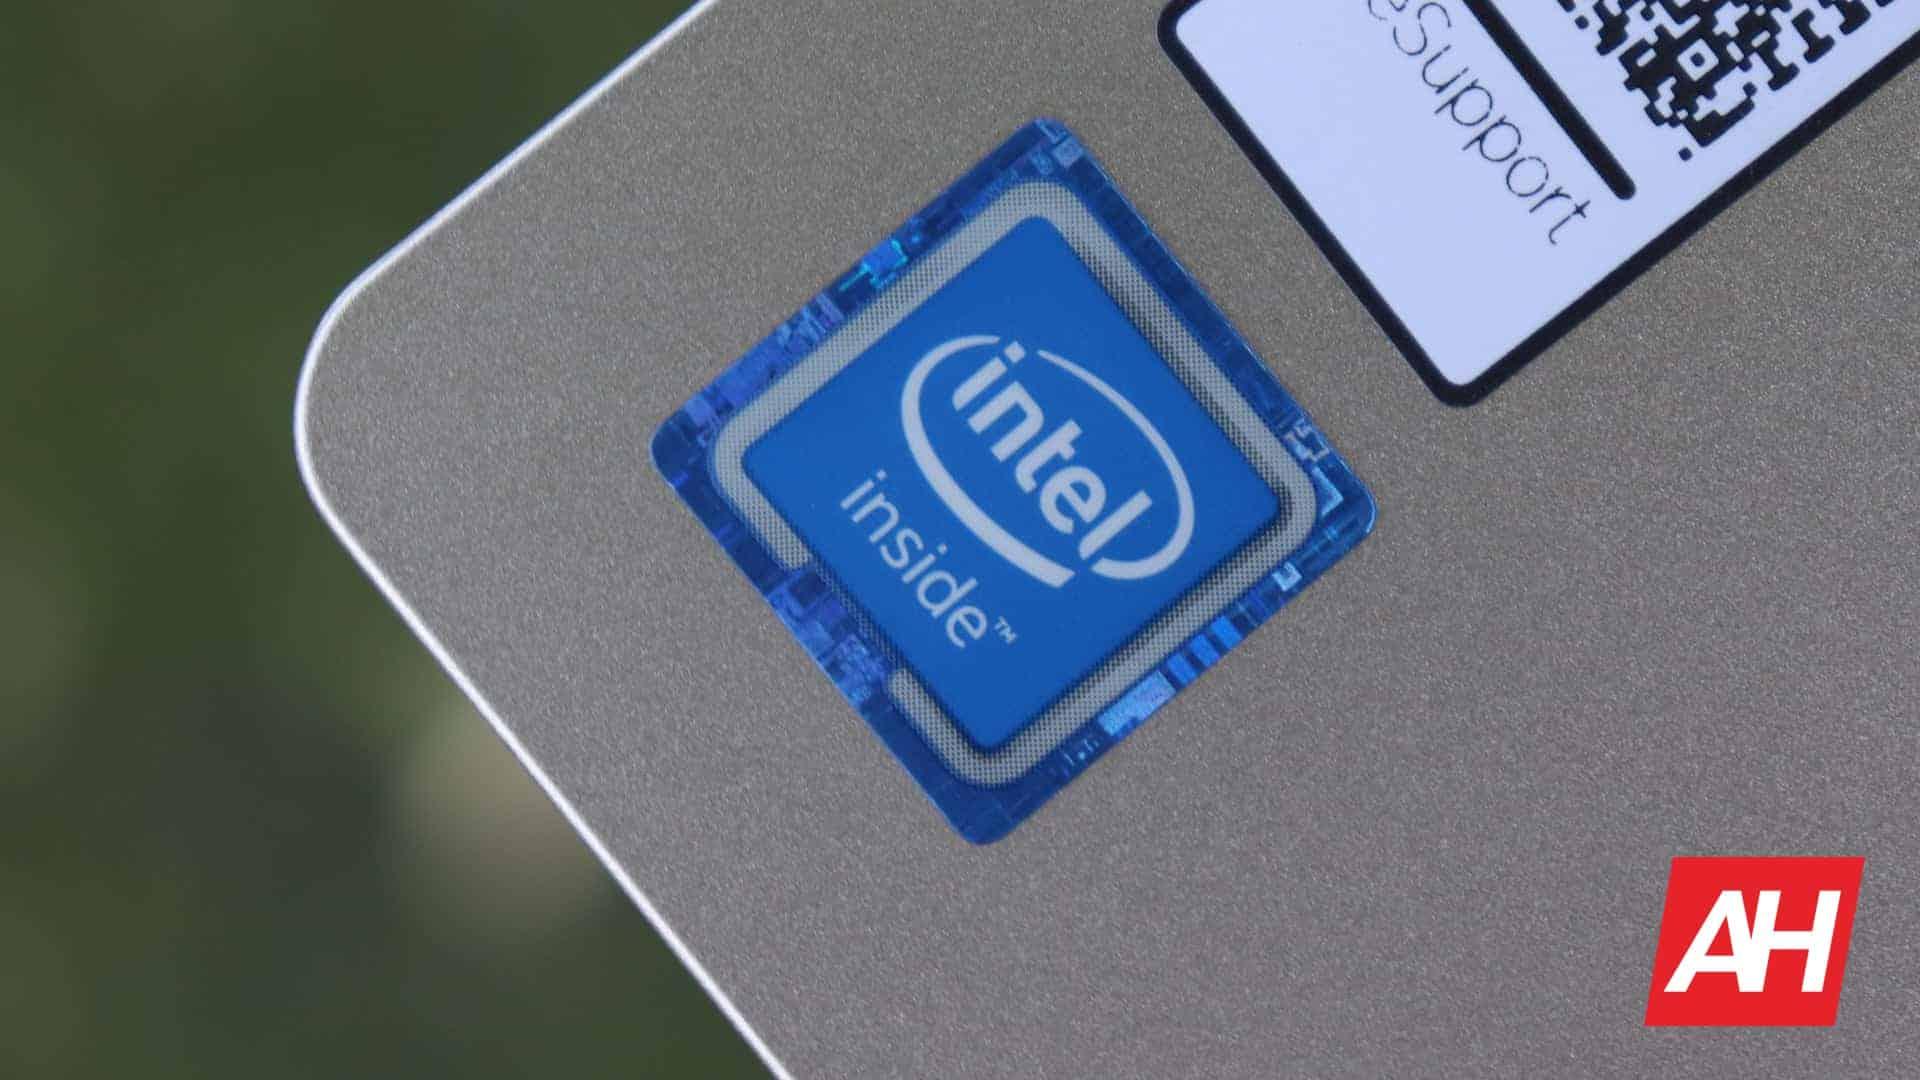 04 Lenovo IdeaPad Chromebook Flex 3 Review Performance AH 2020